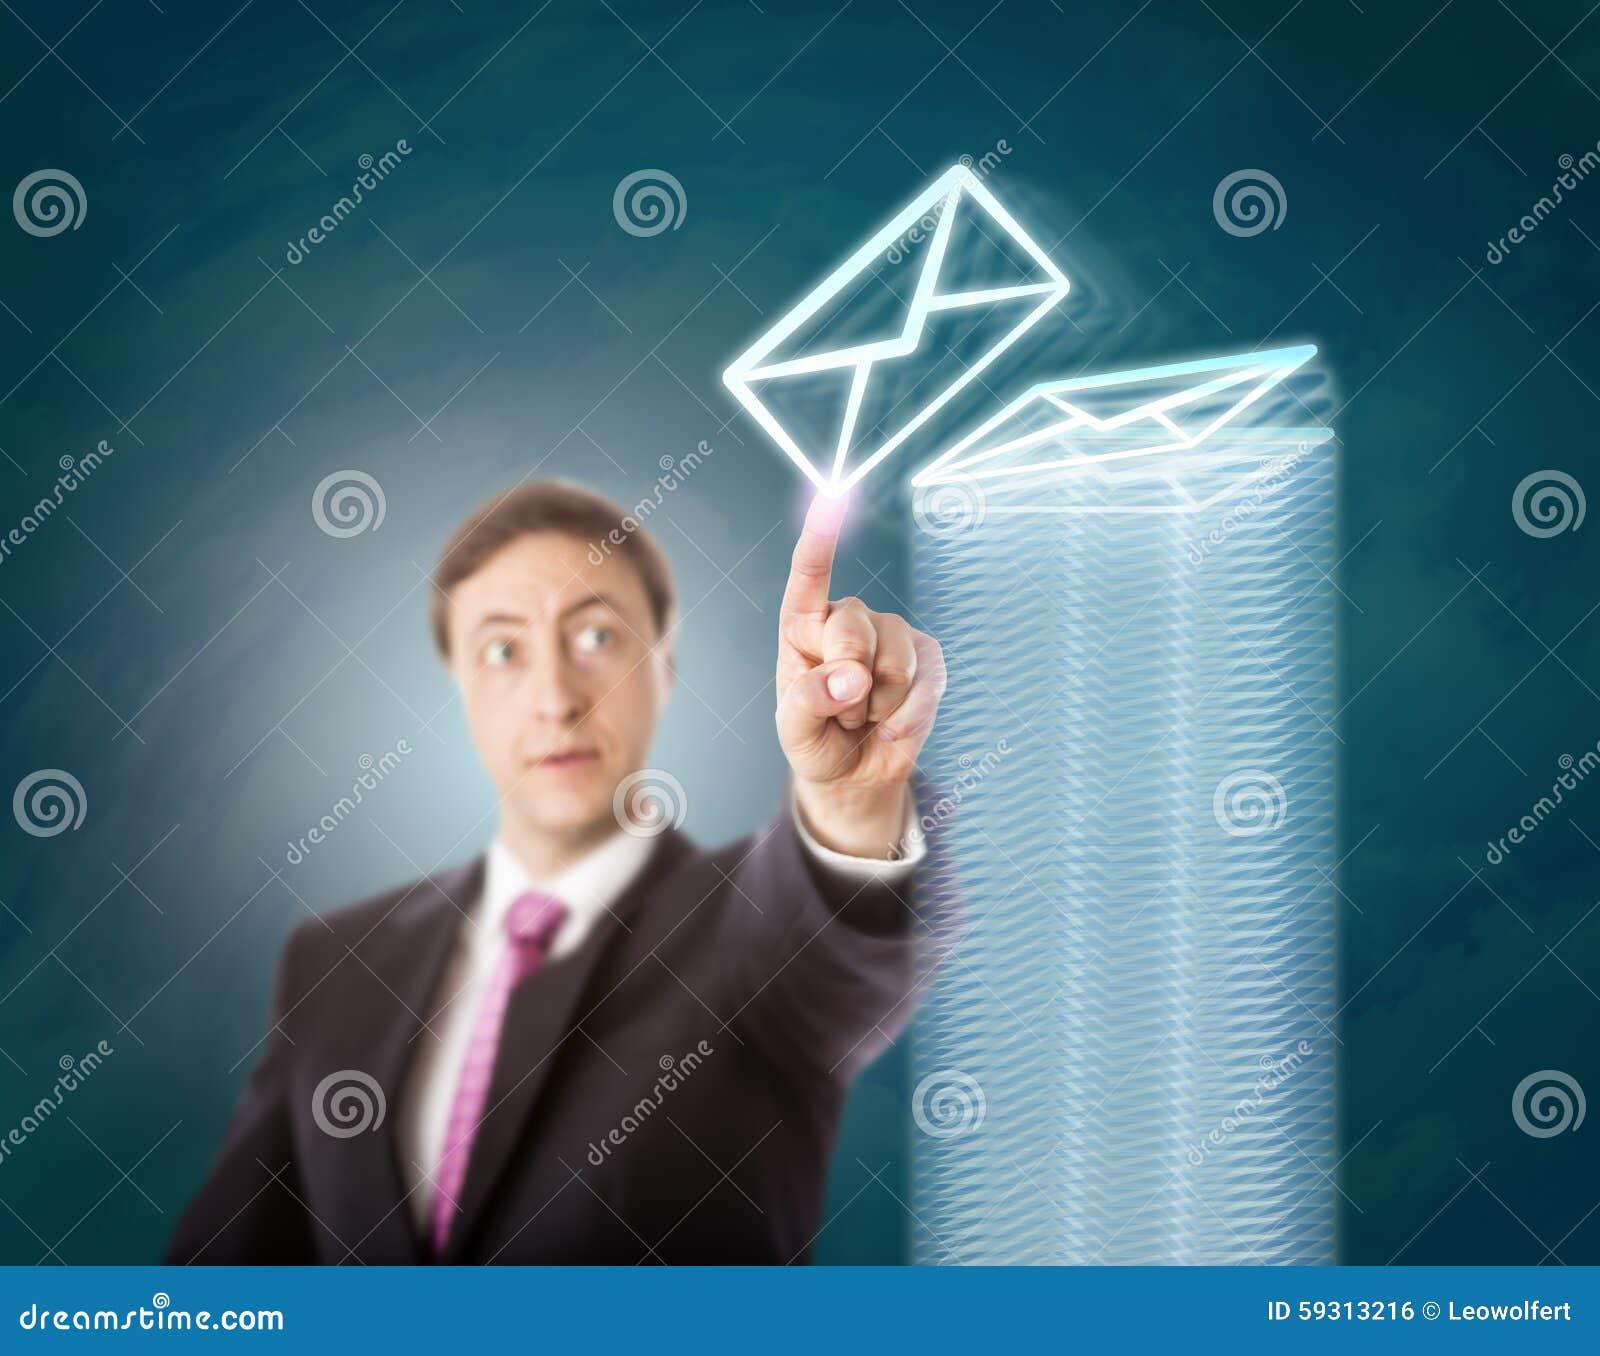 Encargado con exceso de trabajo Stacking Virtual Documents